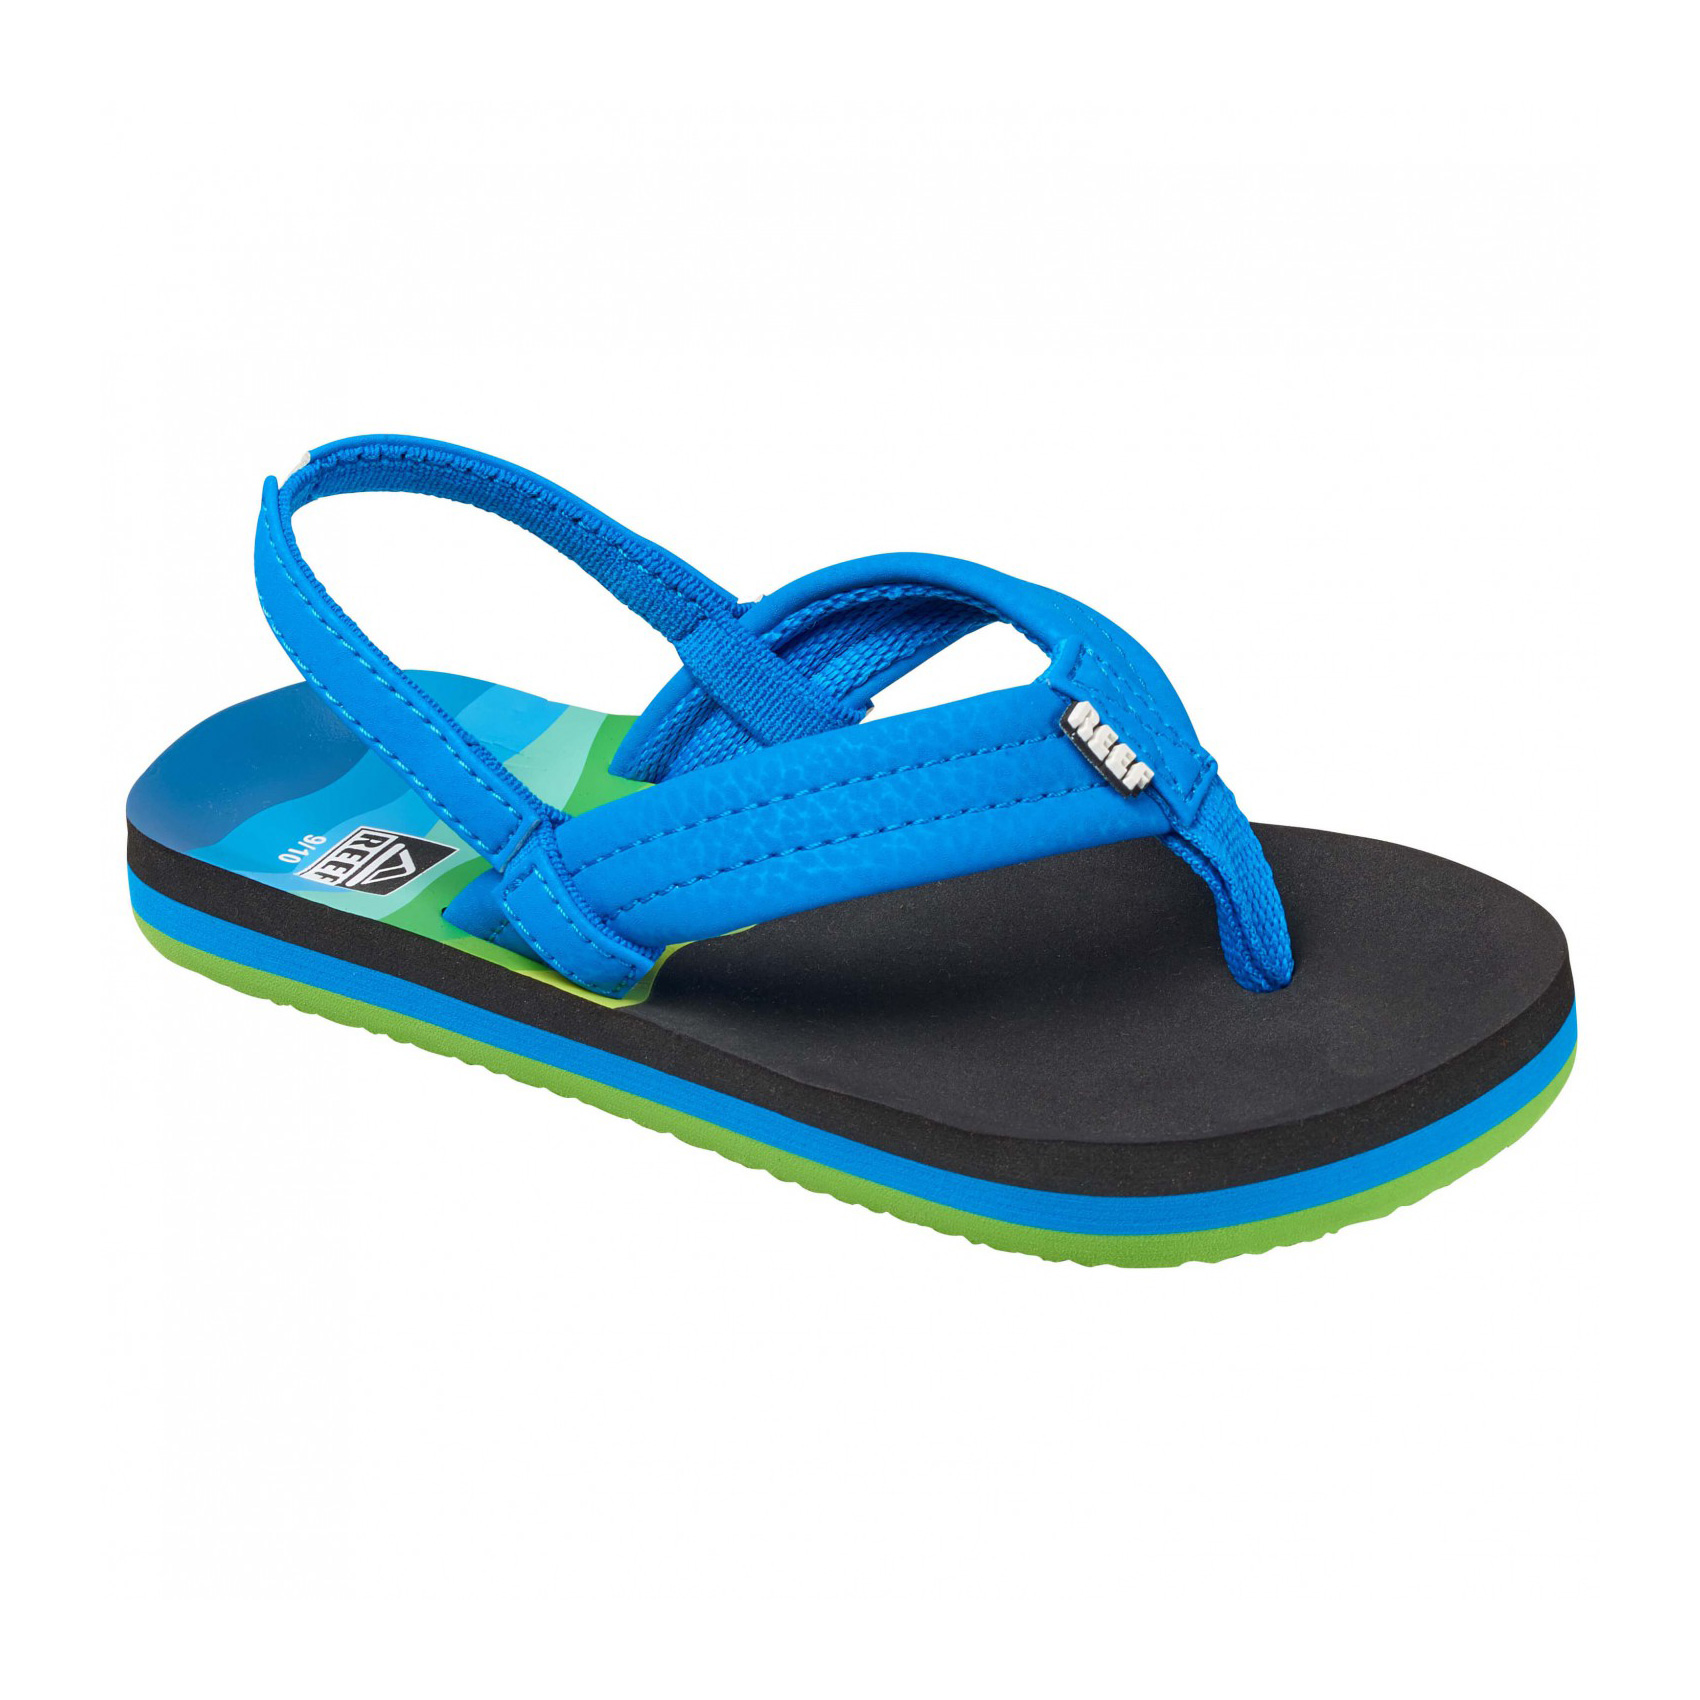 dccf300c55cb Reef Ahi Flip Flops Kids